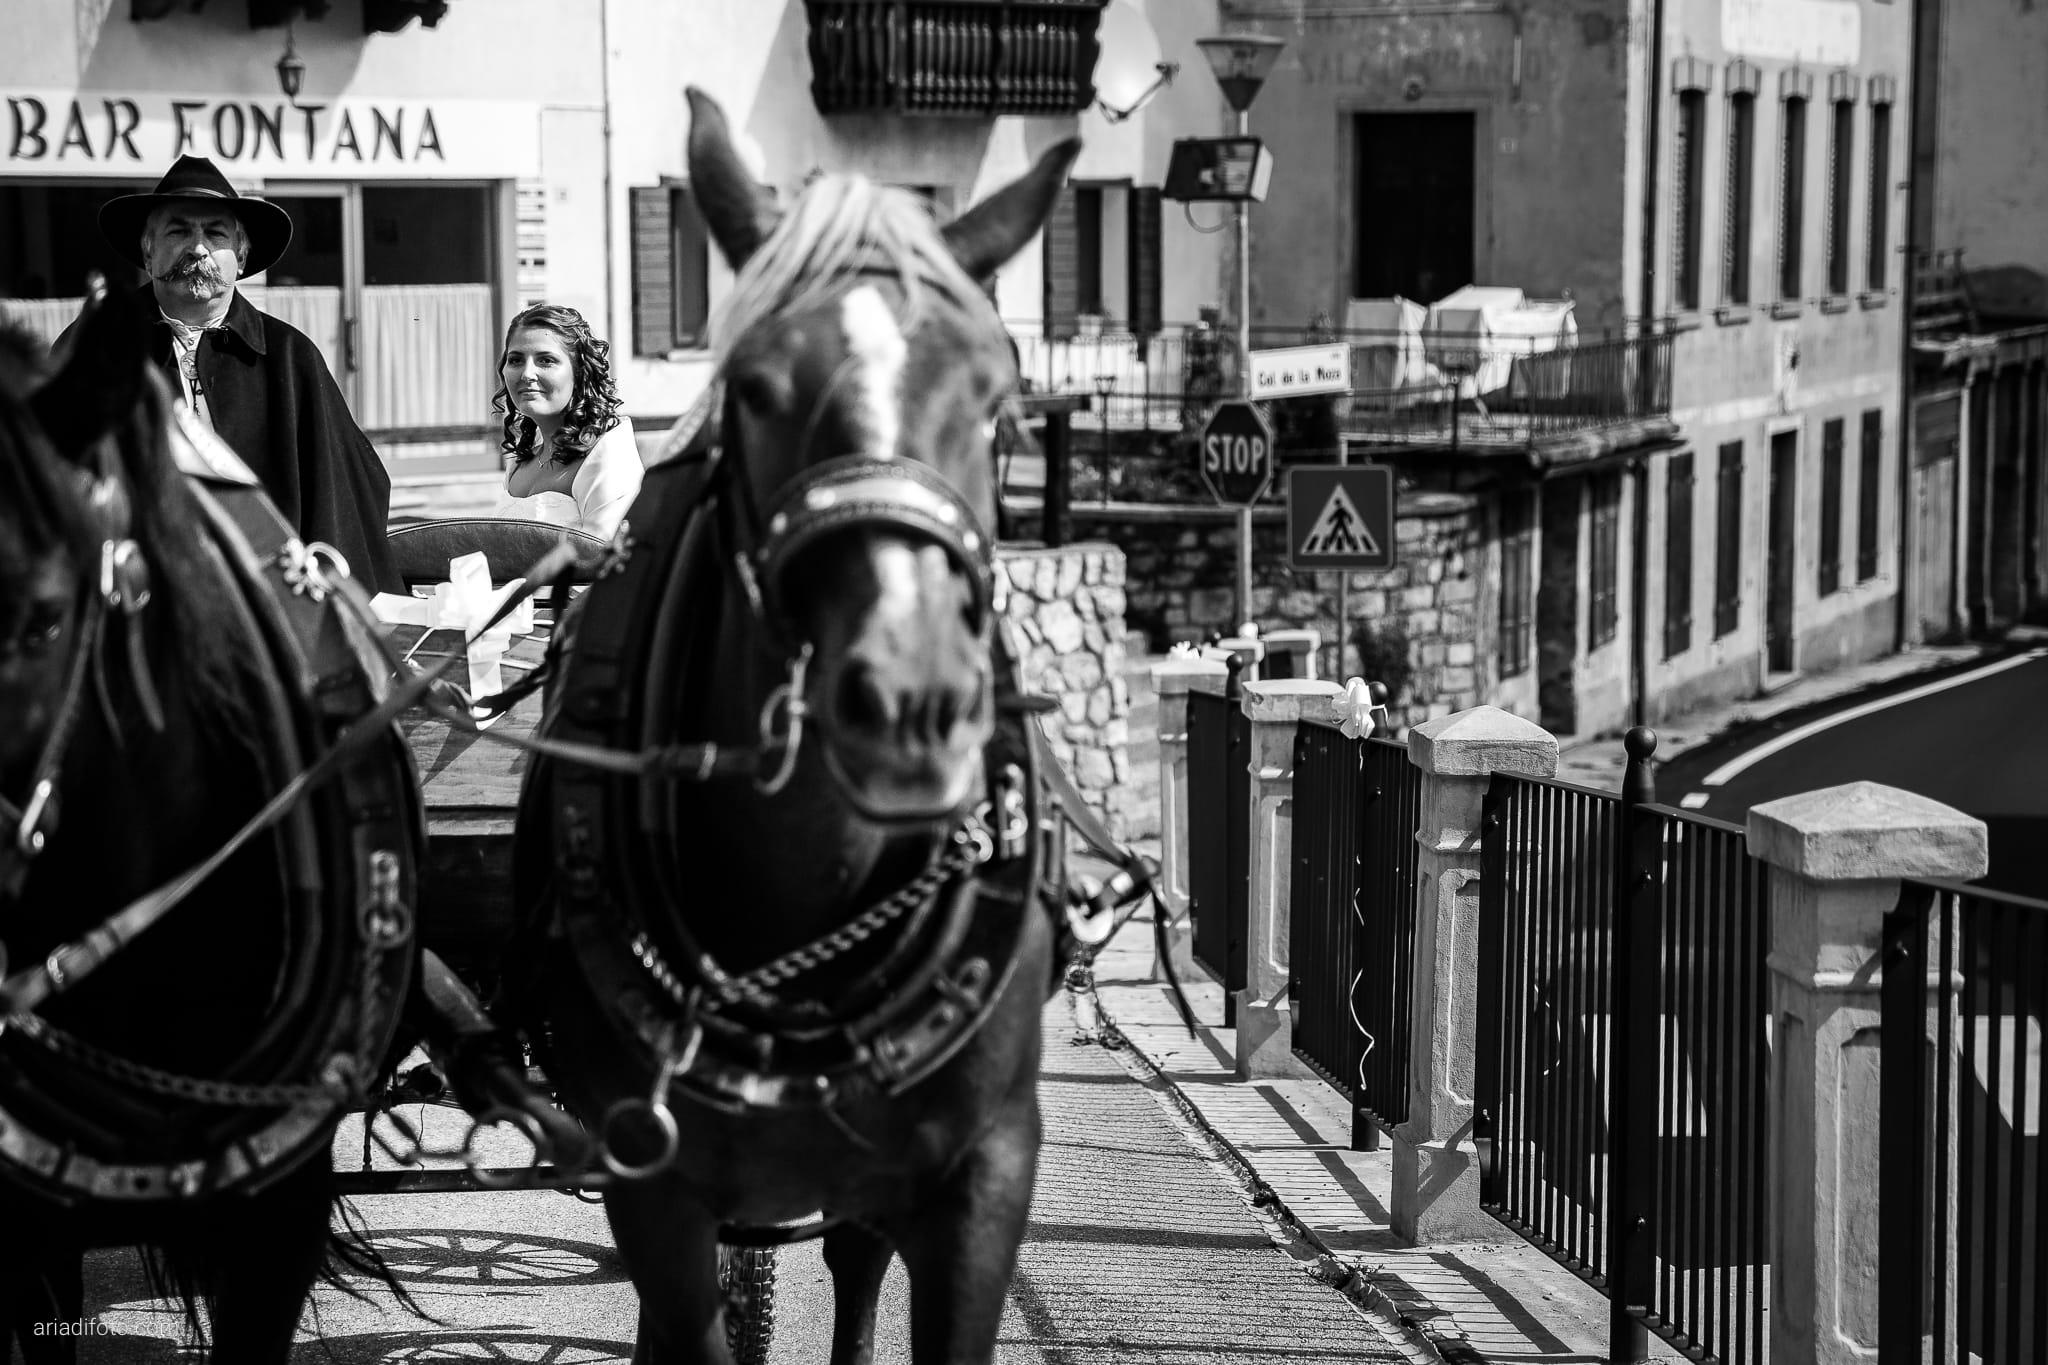 Elisa Gabriele matrimonio Veneto Val Zoldana Belluno momenti carrozza cavalli